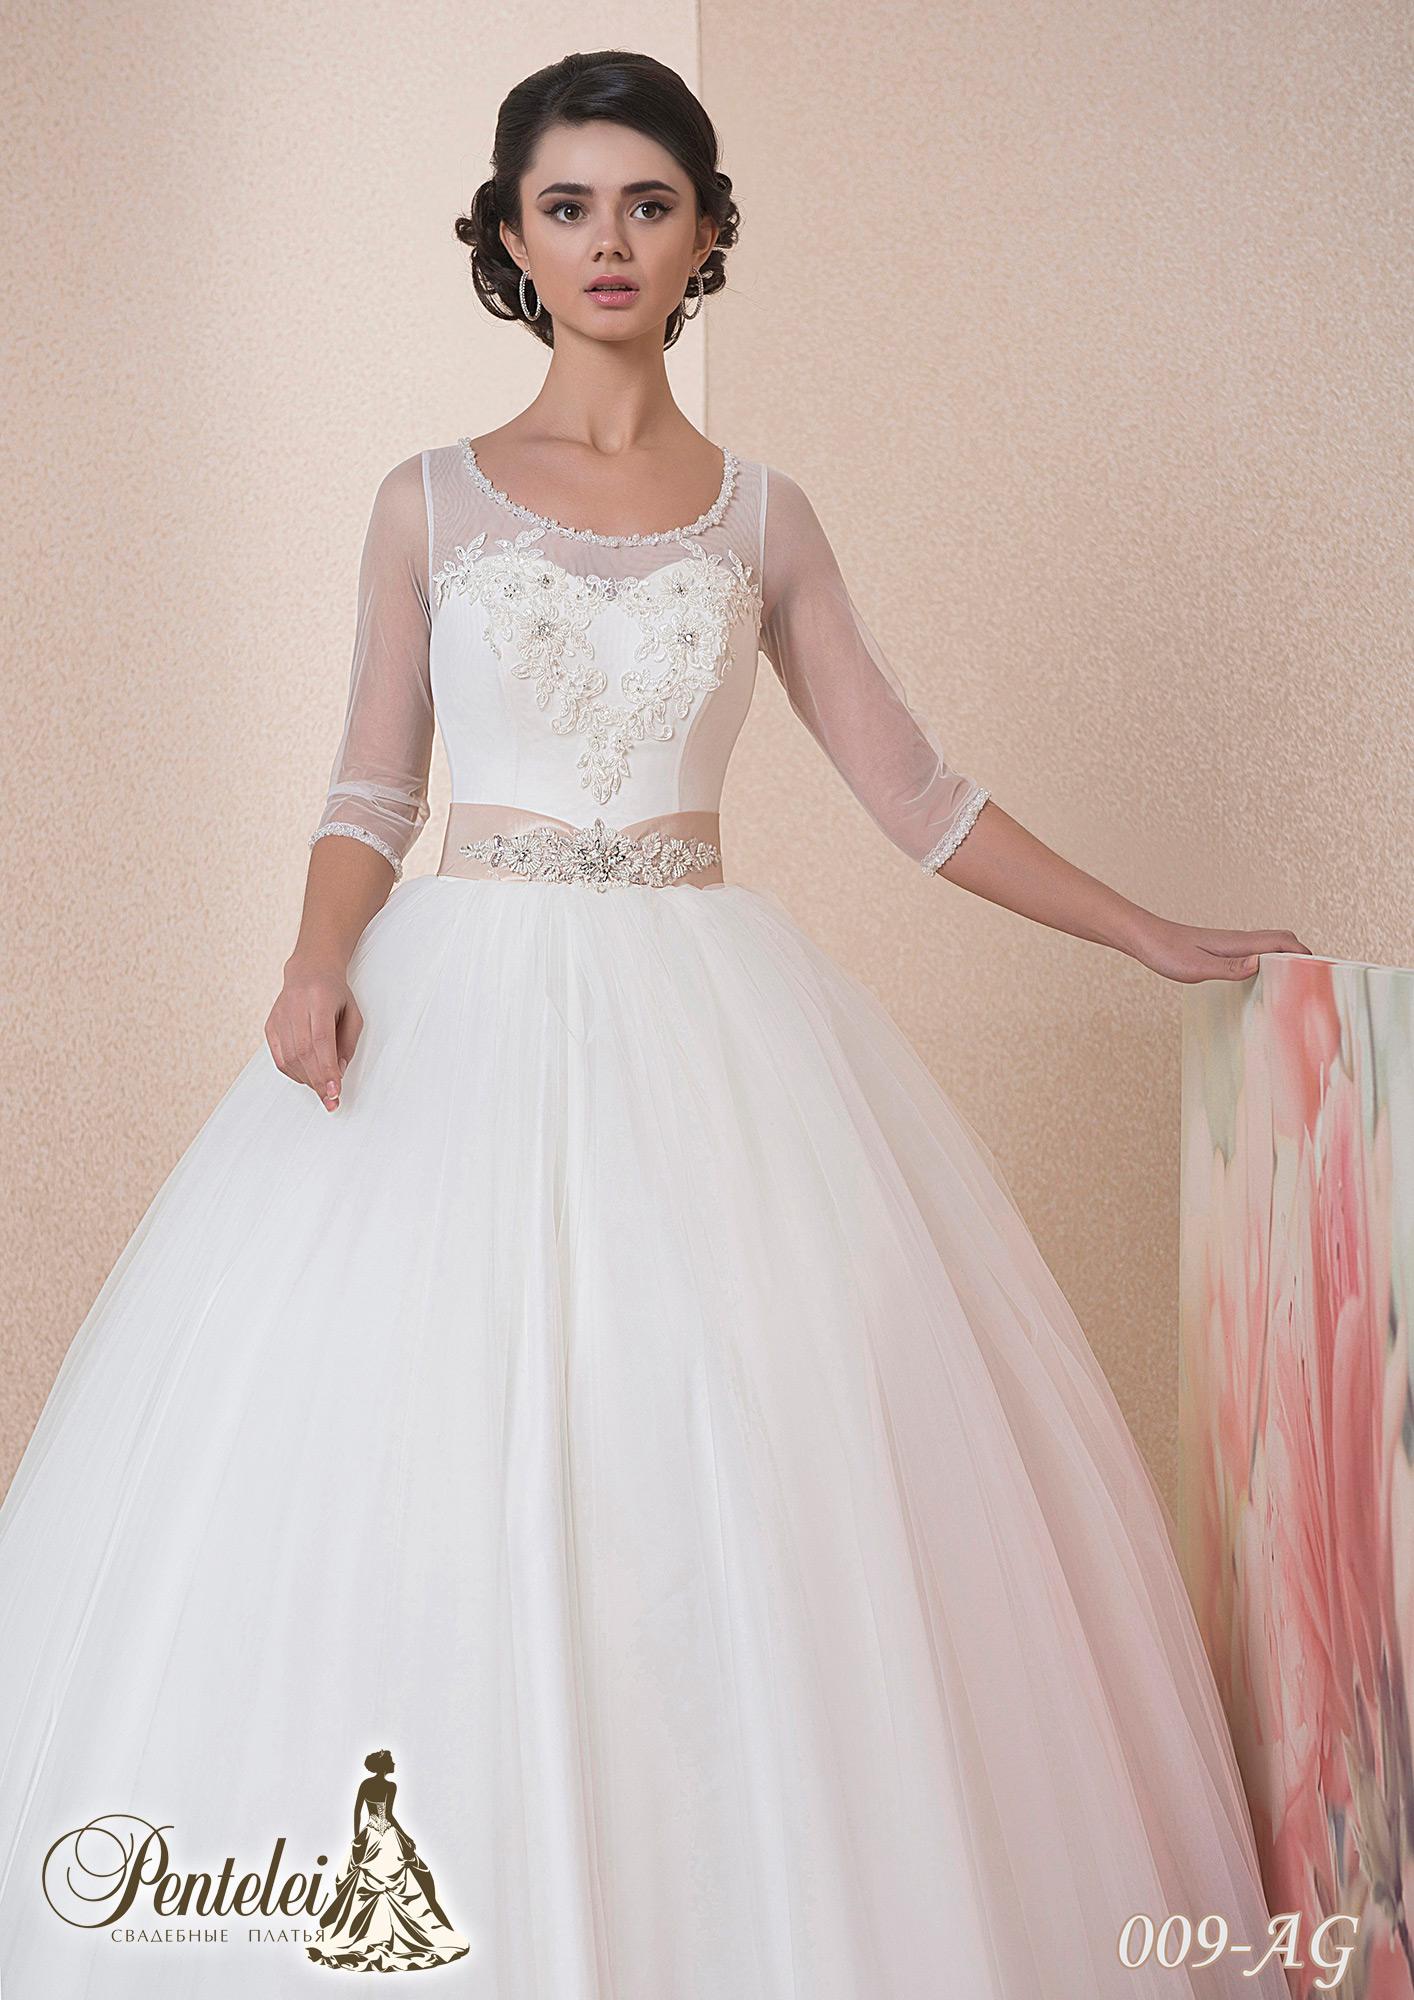 009-AG | Cumpăra rochii de mireasă en-gros de Pentelei